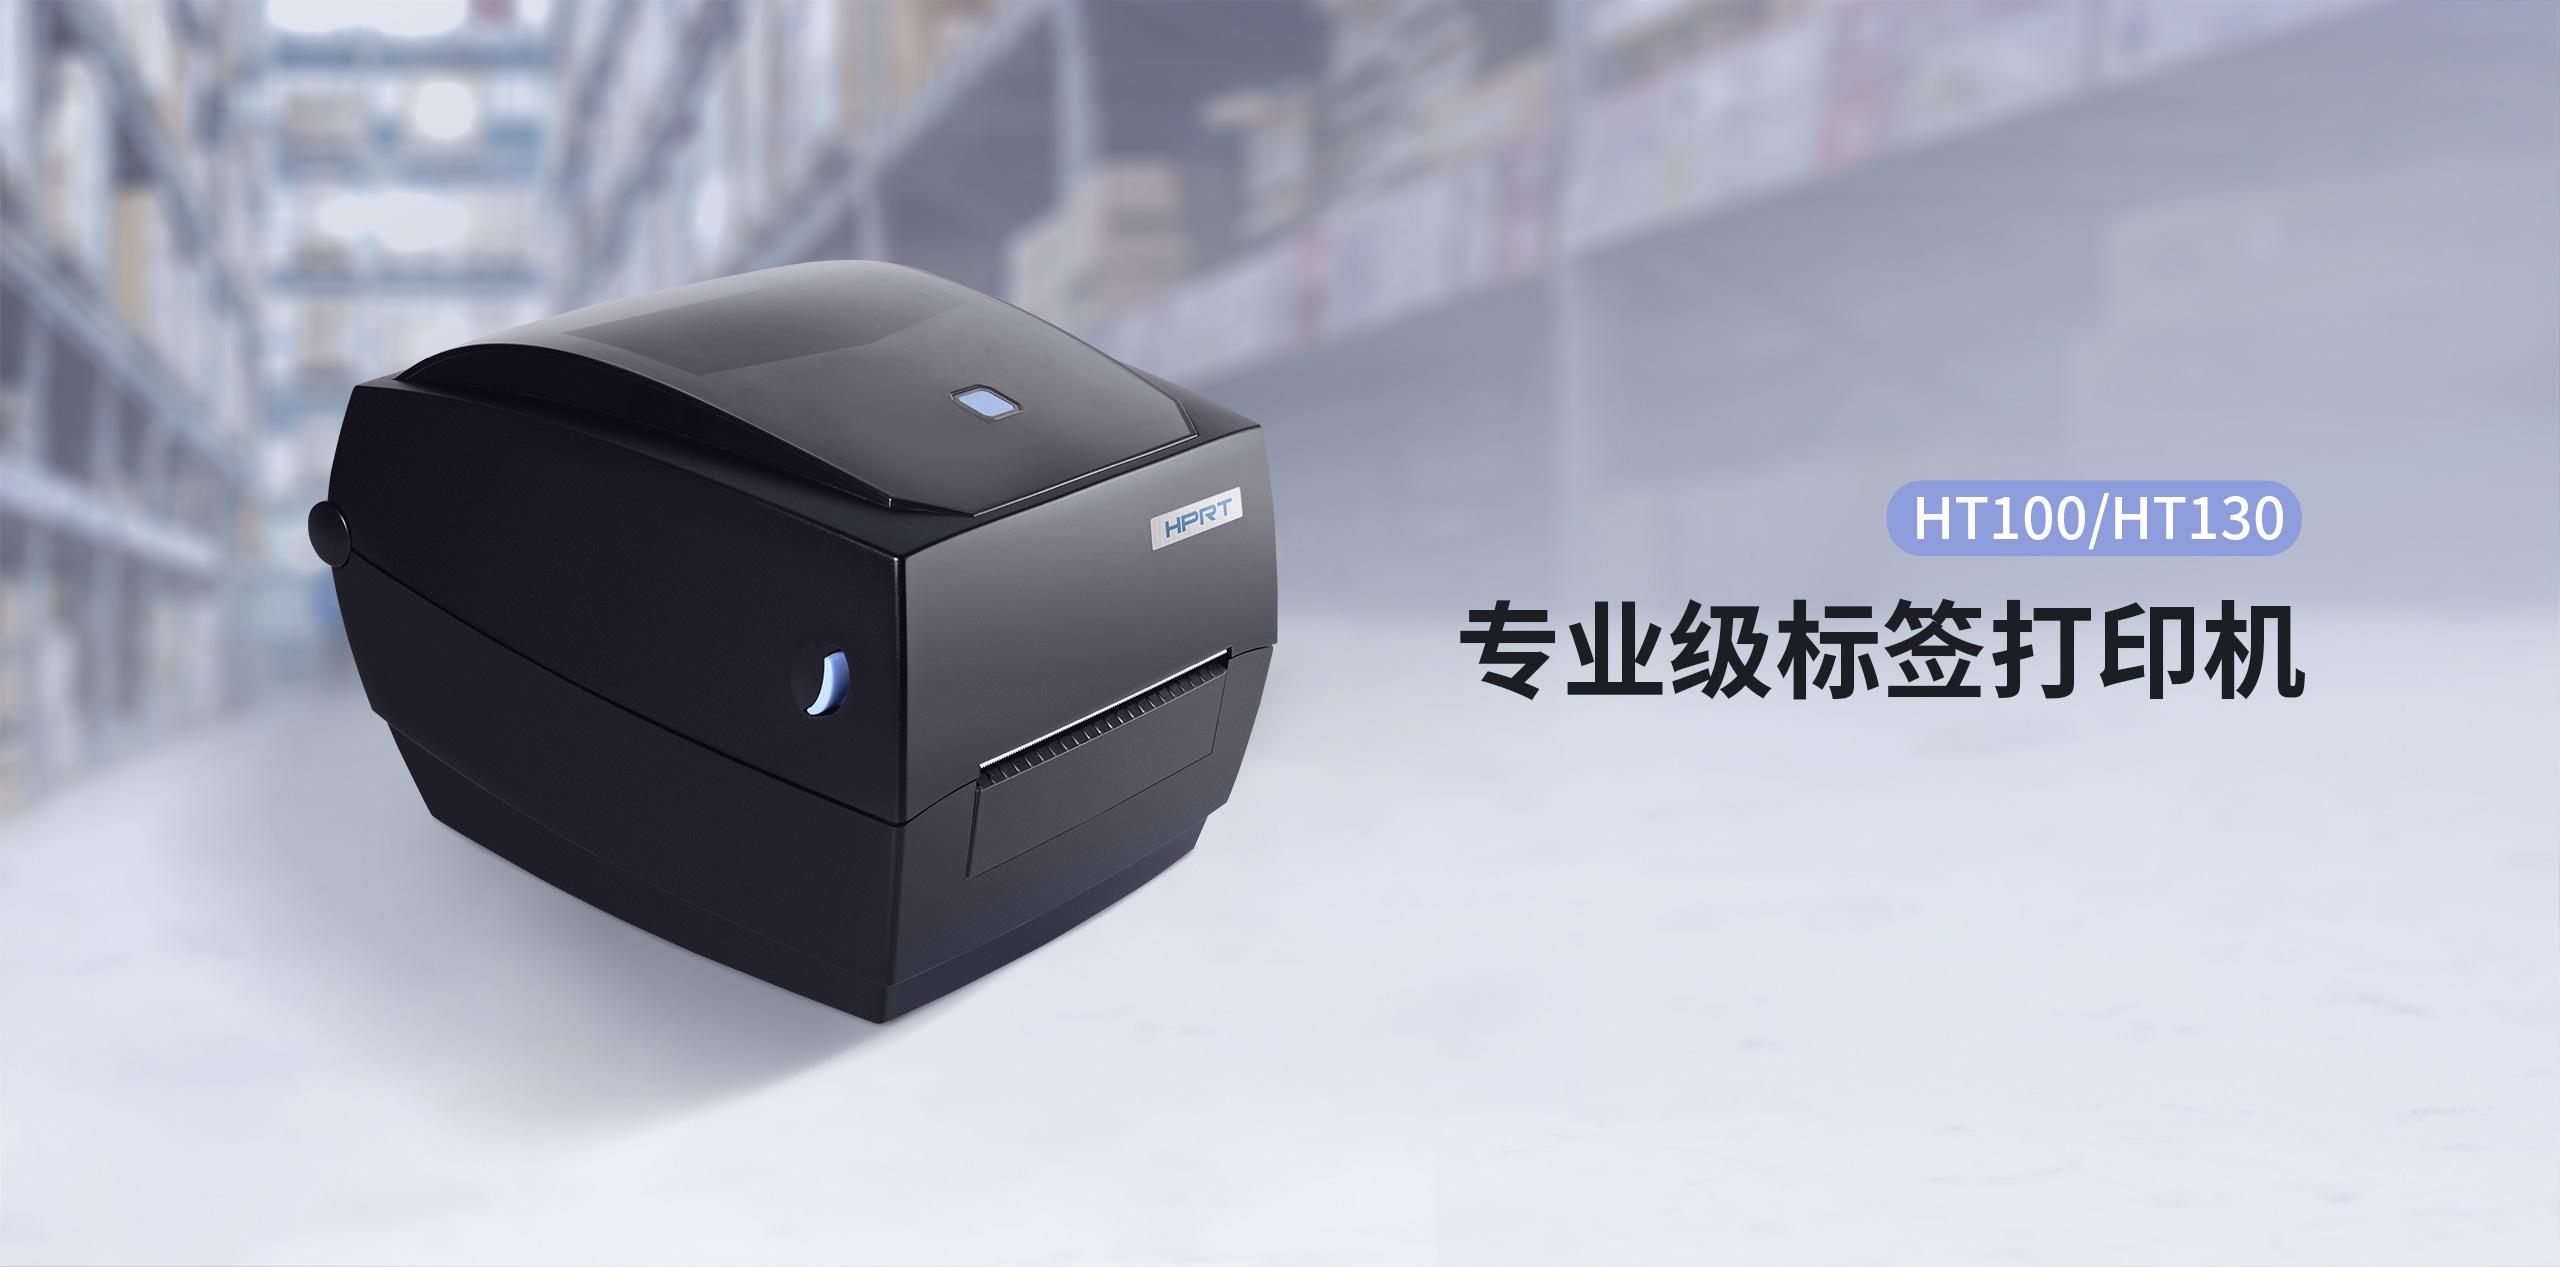 HT100/HT130专业级标签打印机  第1张